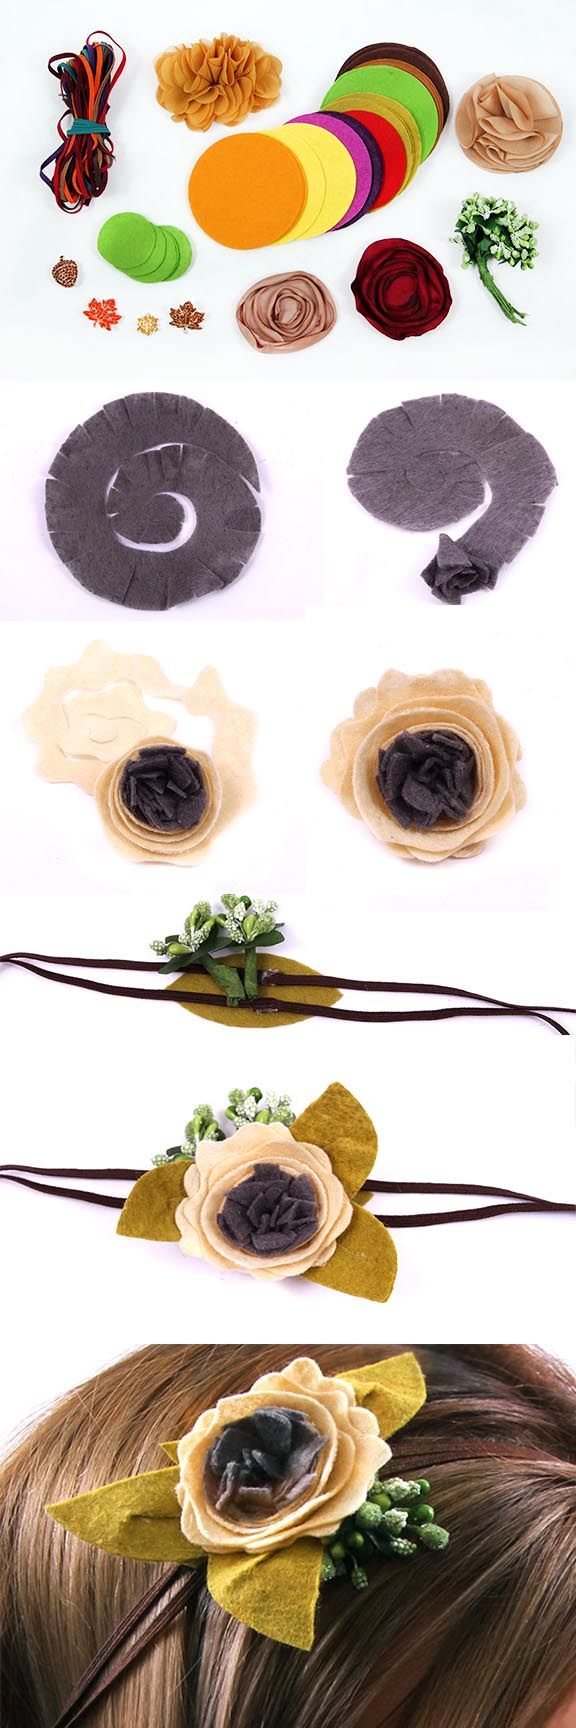 How to Make a Felt Flower Headband- add a new style of felt flower to your handmade headband repertoire!